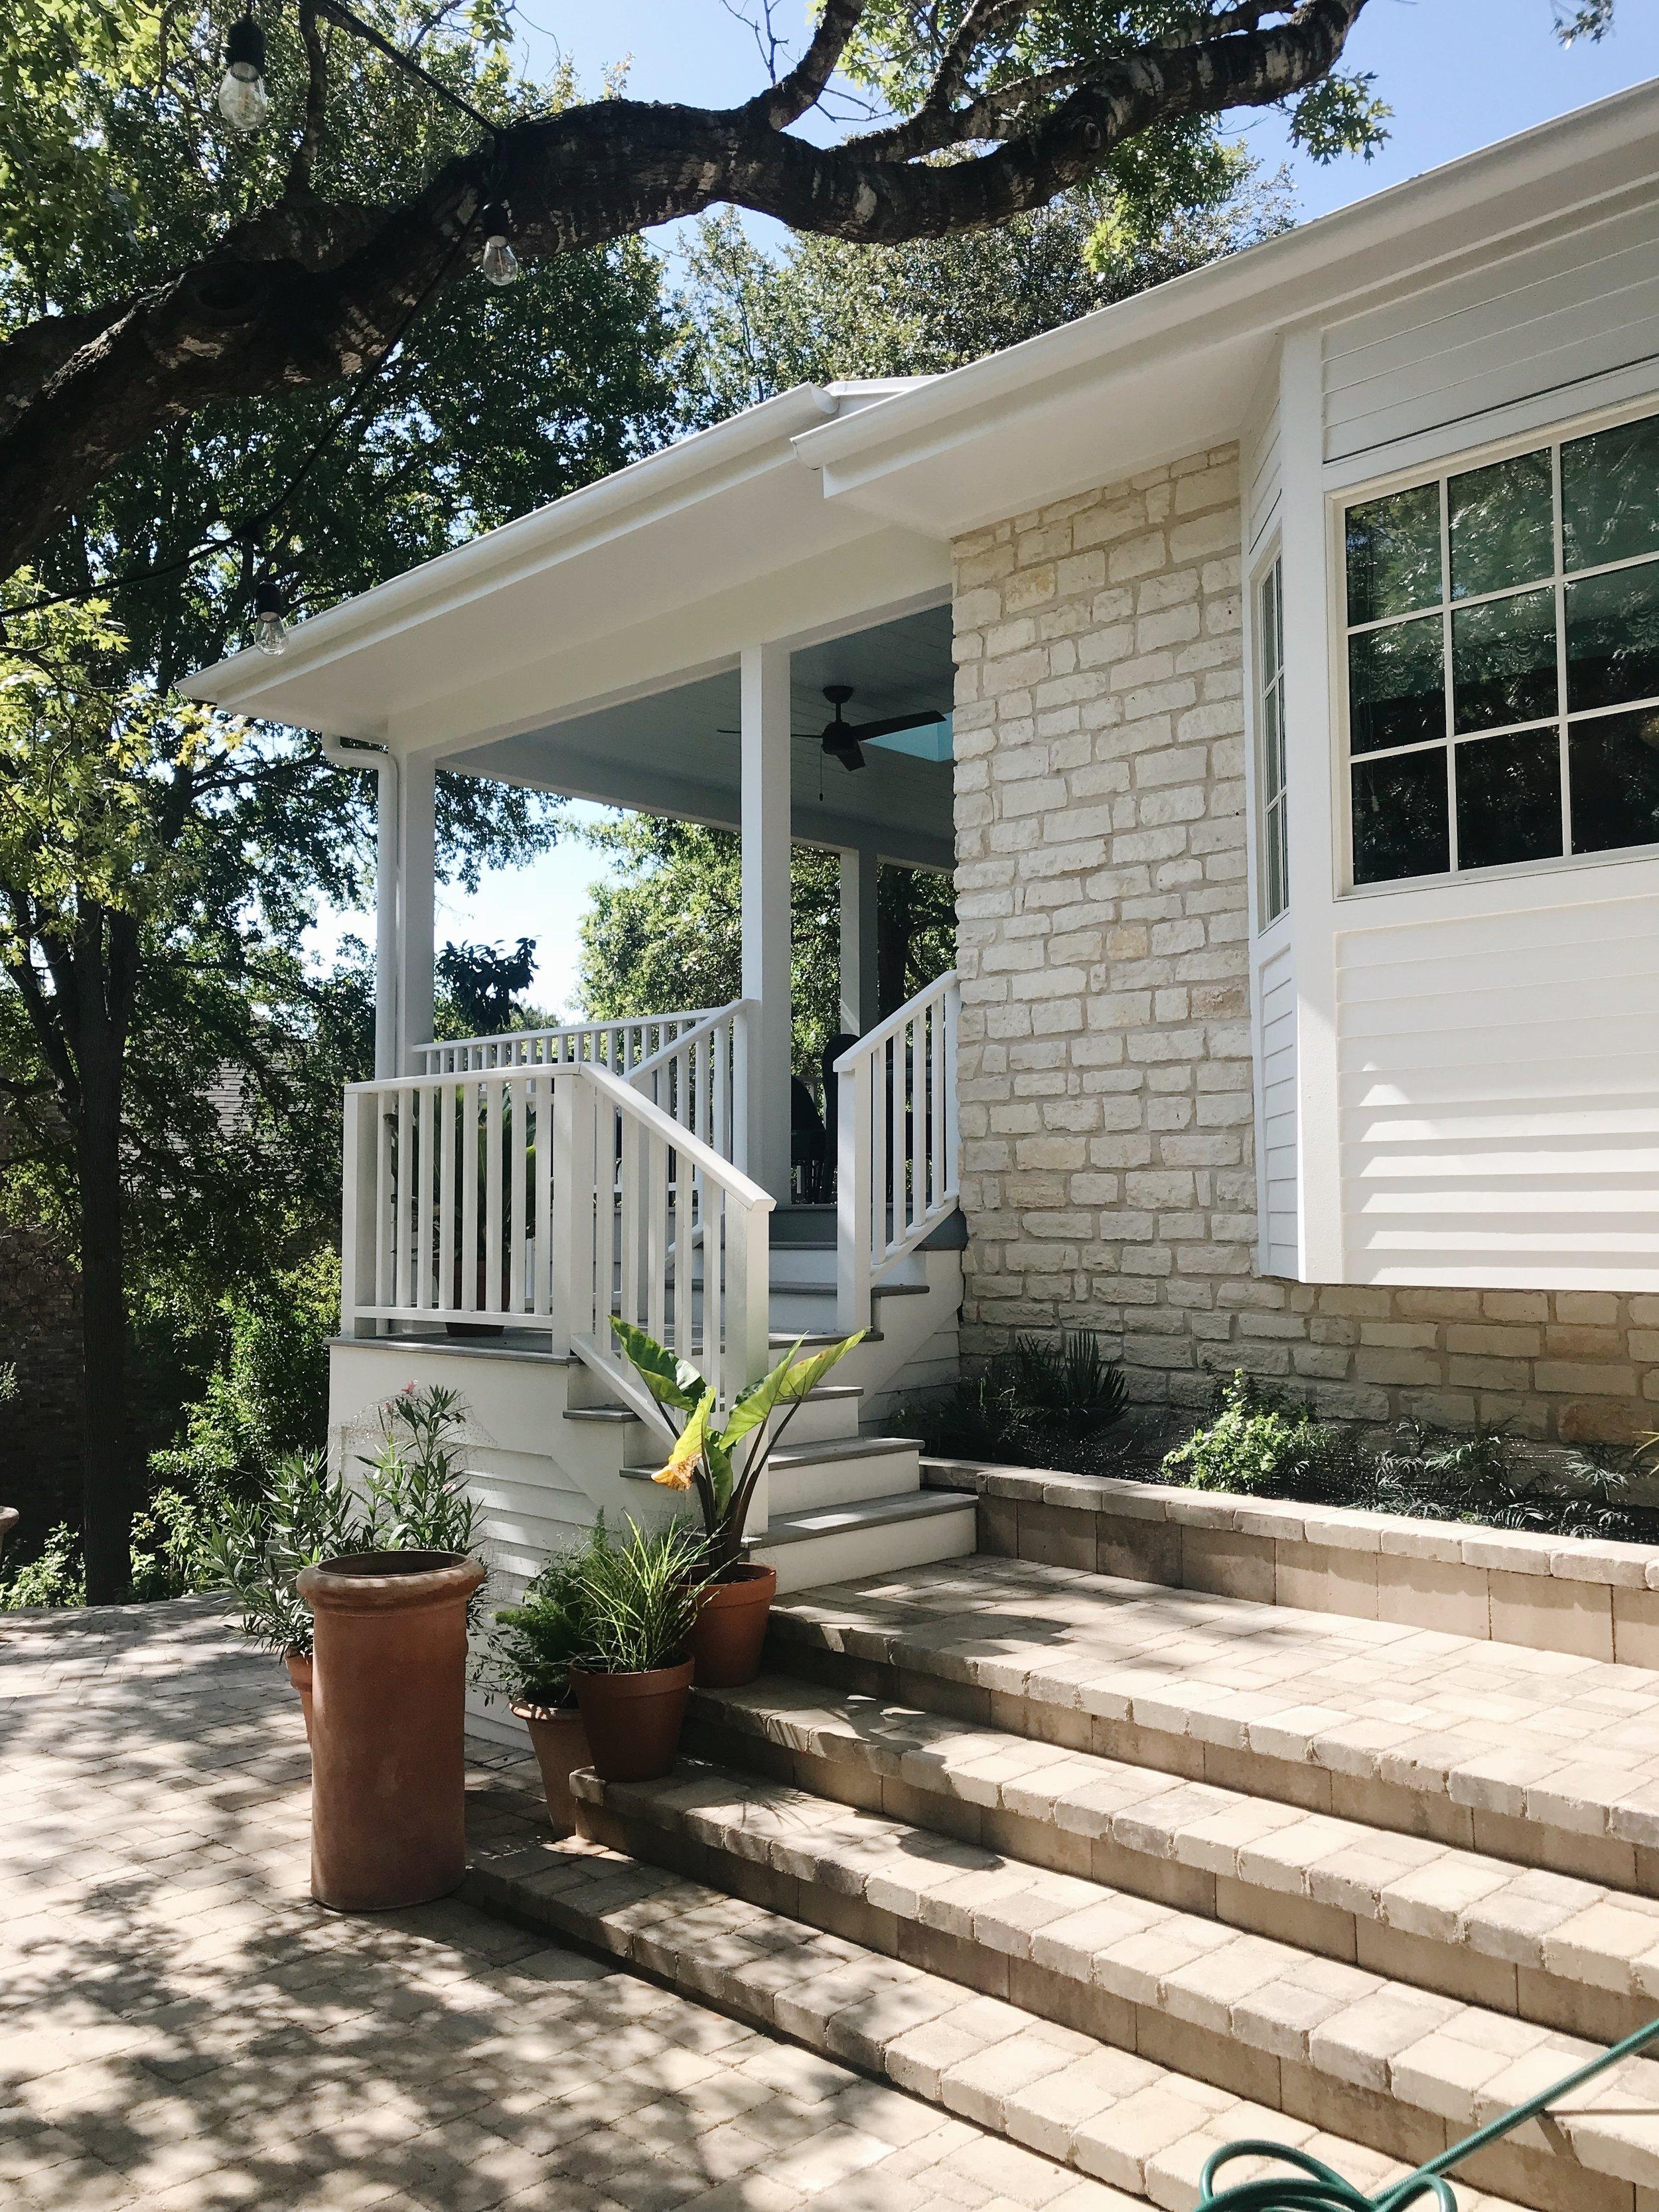 Avery Cox Design Blog: Southern Living 2018 Austin Idea House by Meredith Ellis, Backyard